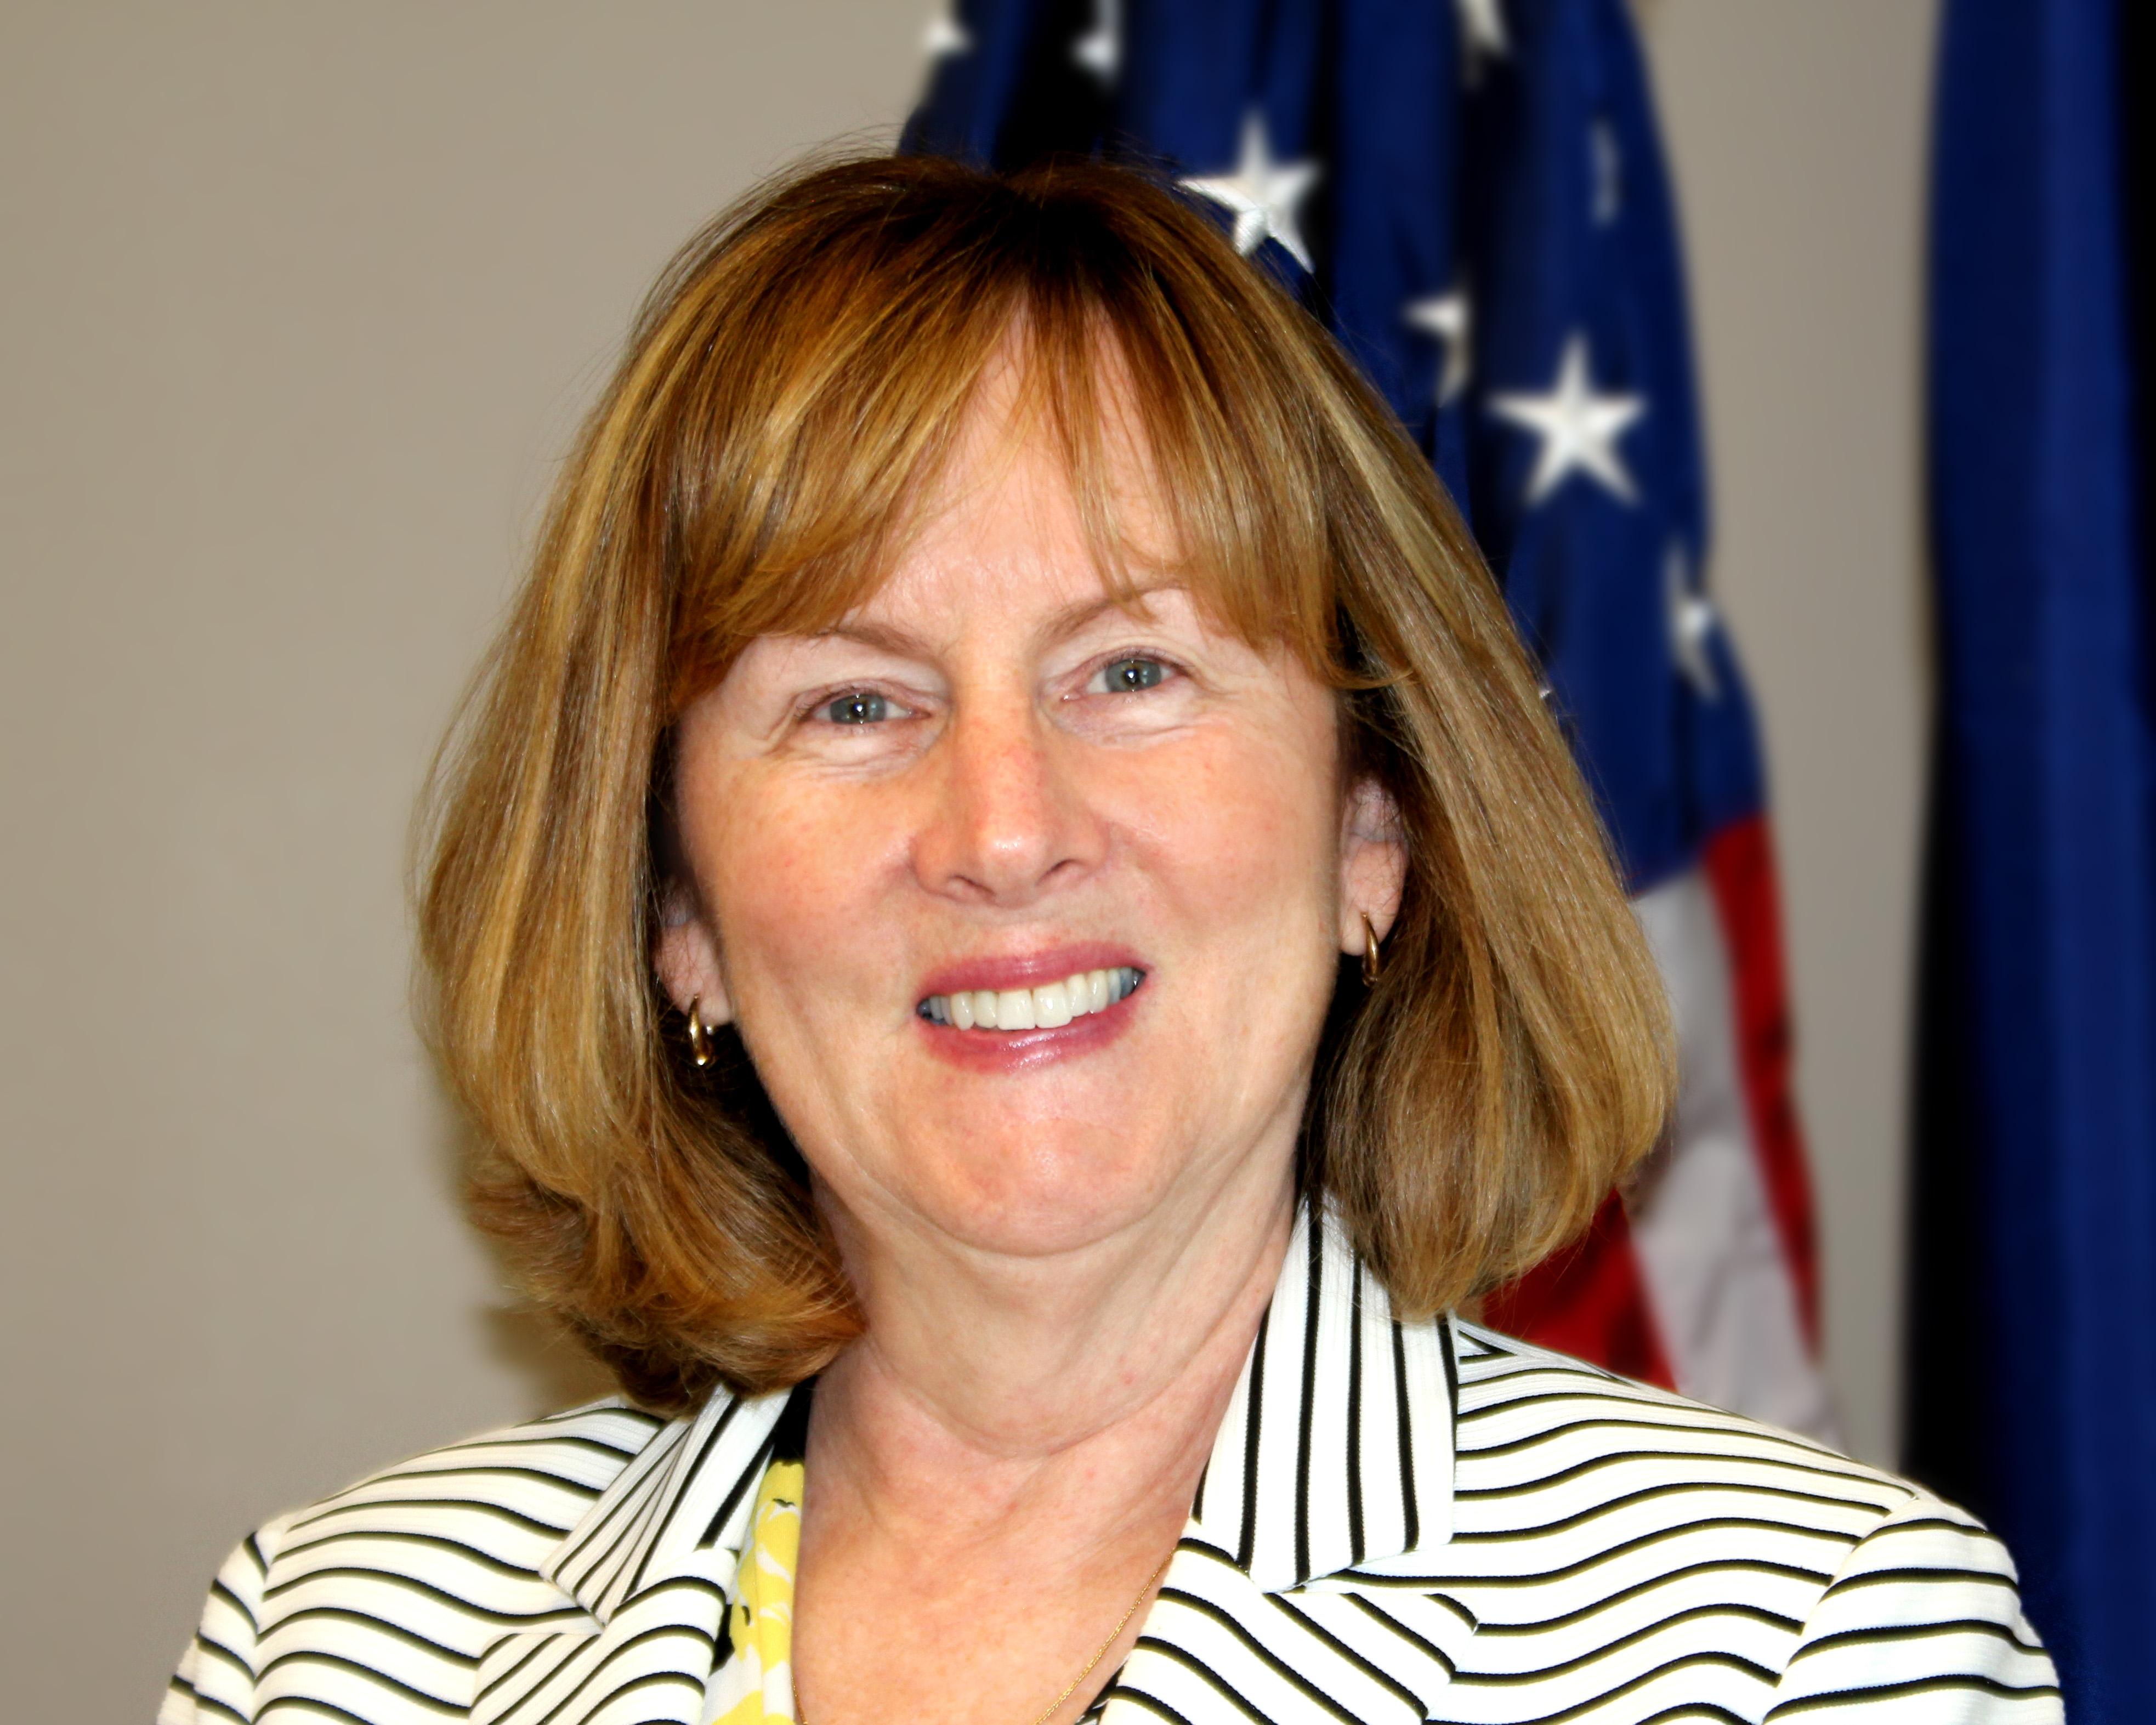 Mary S. Wohlgemuth